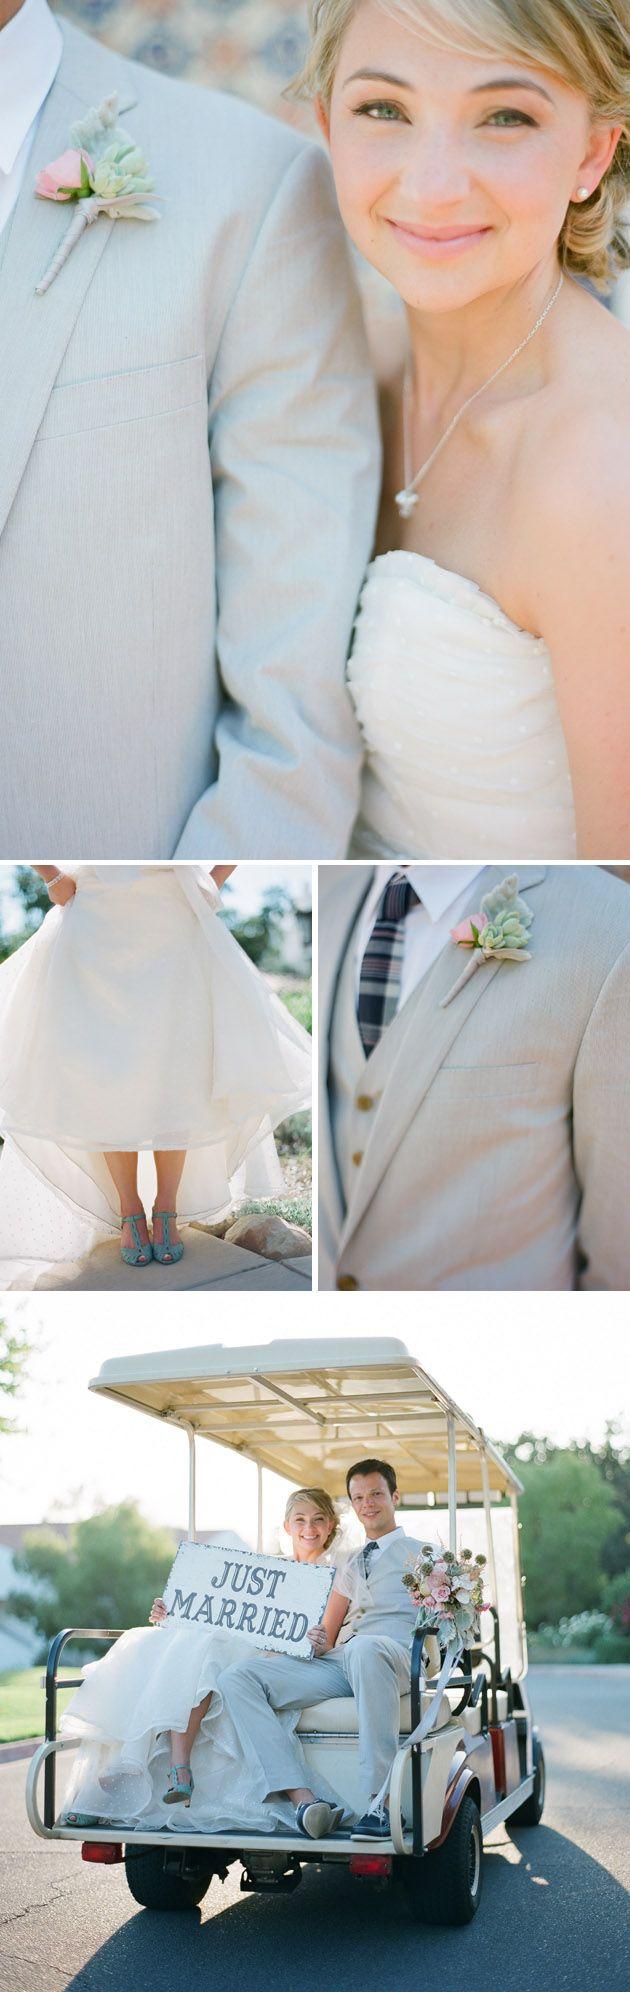 28 best Suits images on Pinterest | Welding clothing, Dress wedding ...